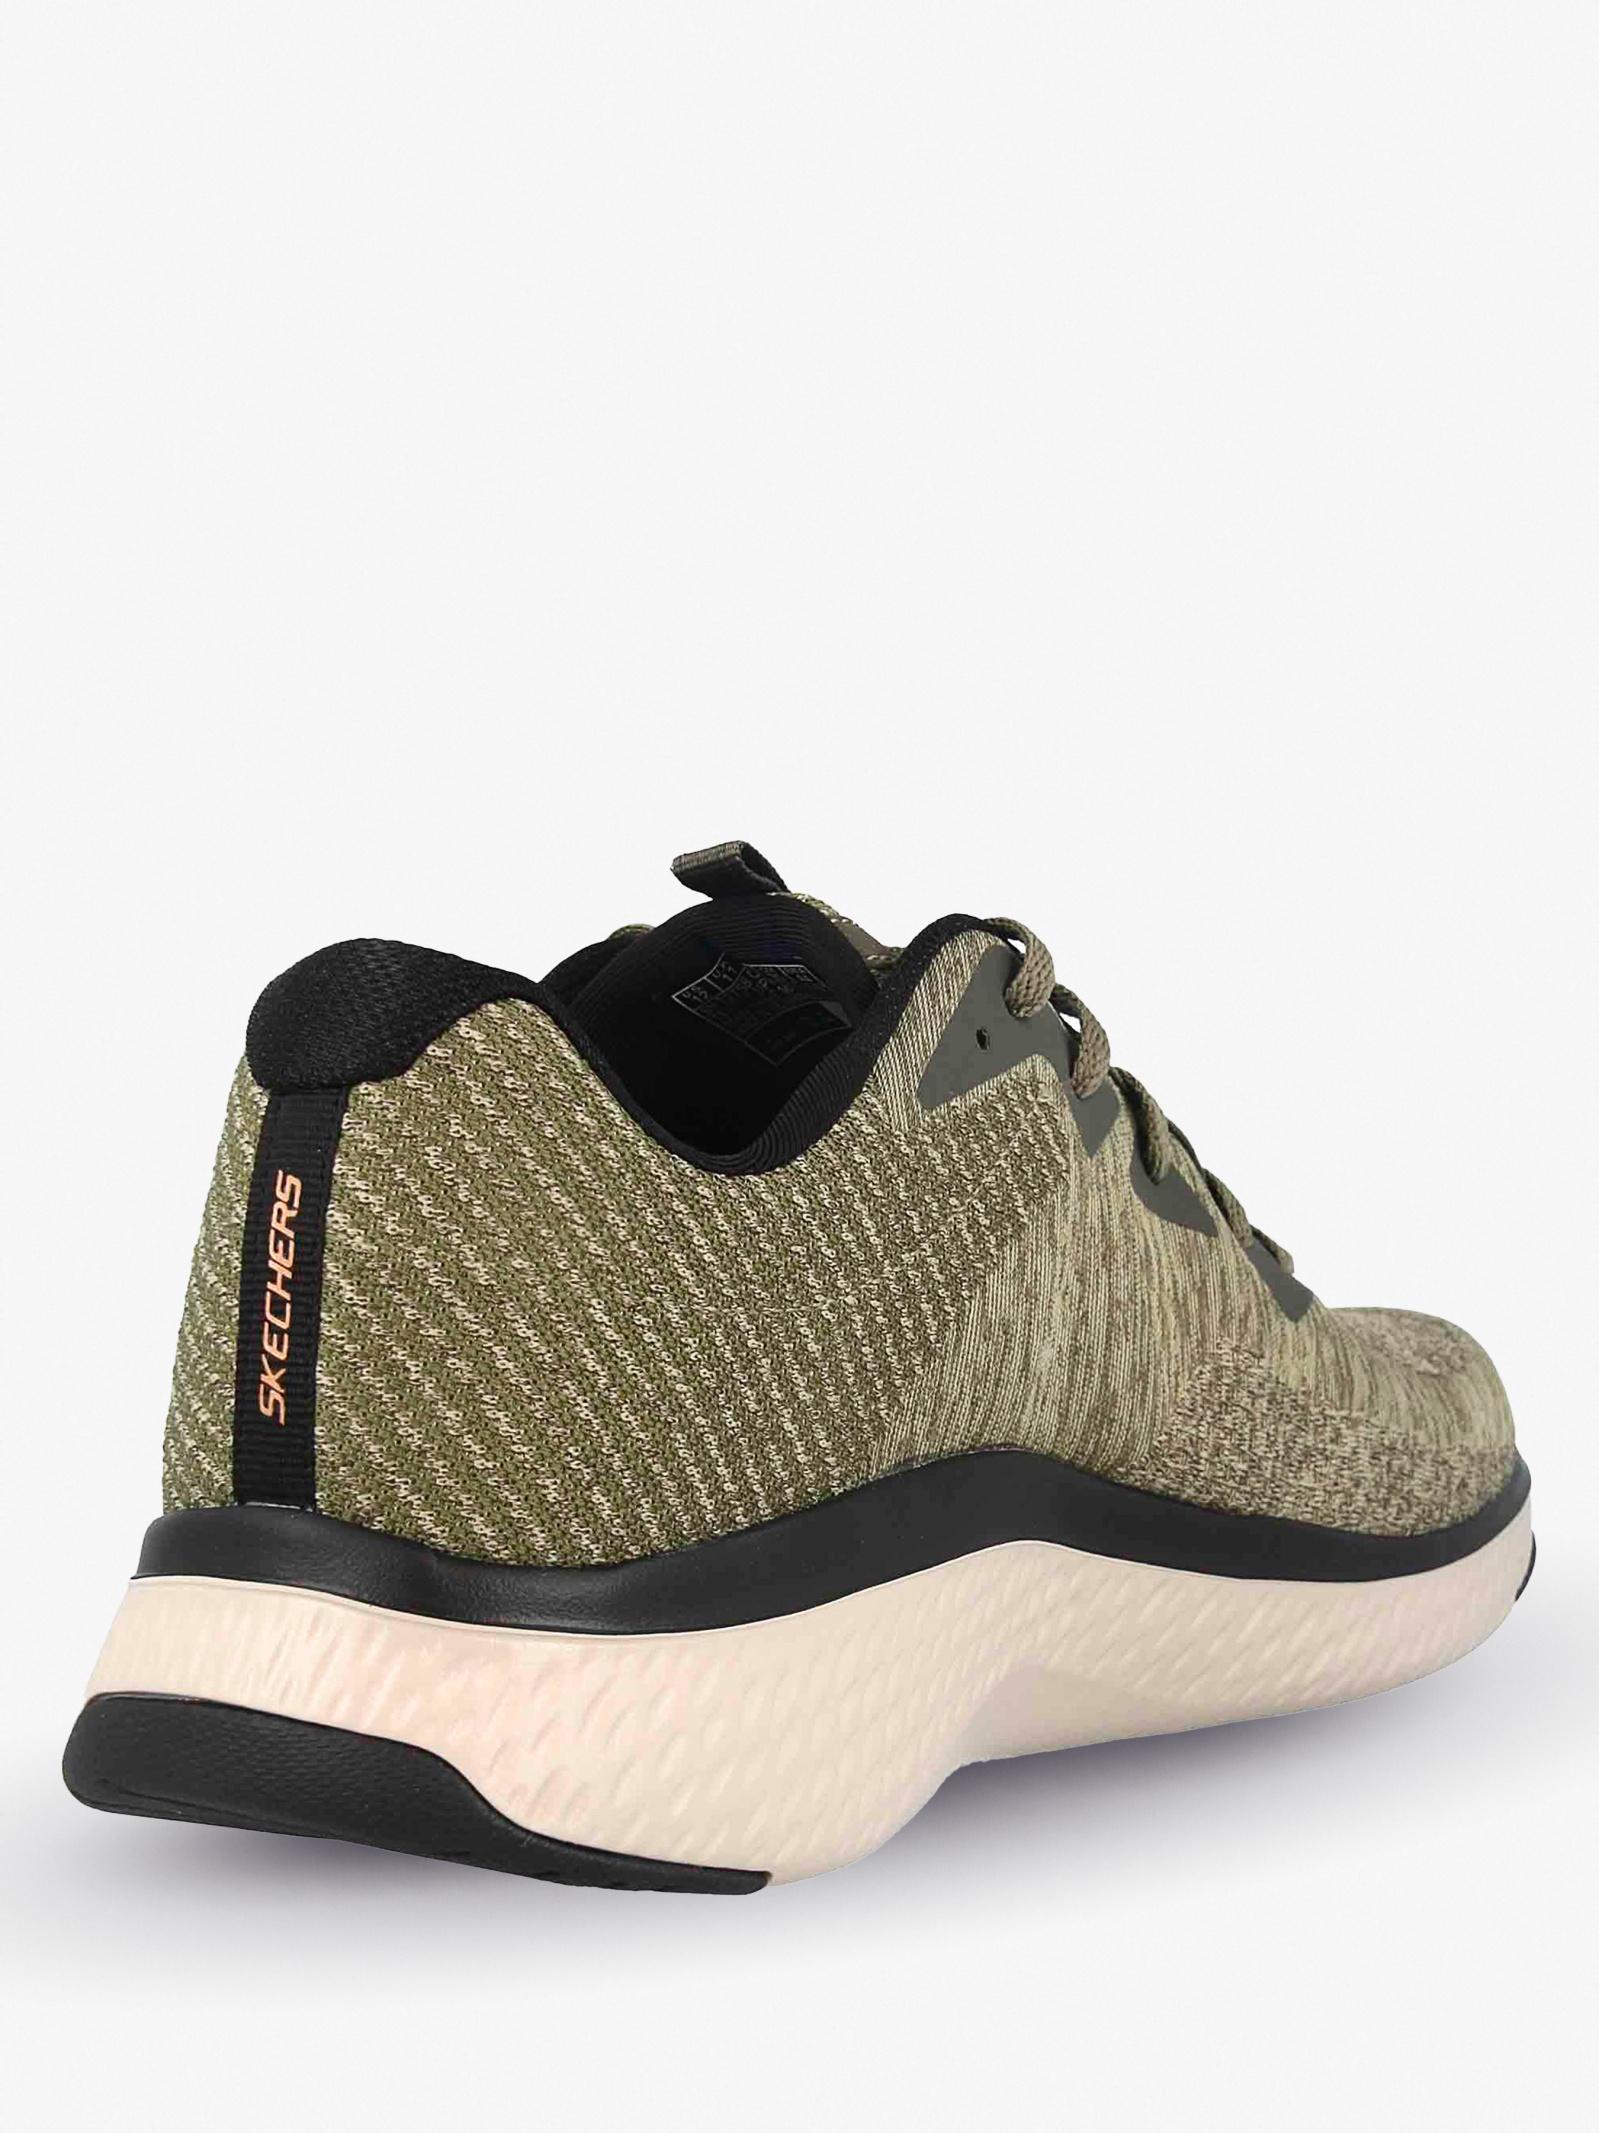 Кроссовки мужские Skechers Mens Sport 52758 OLBK цена обуви, 2017